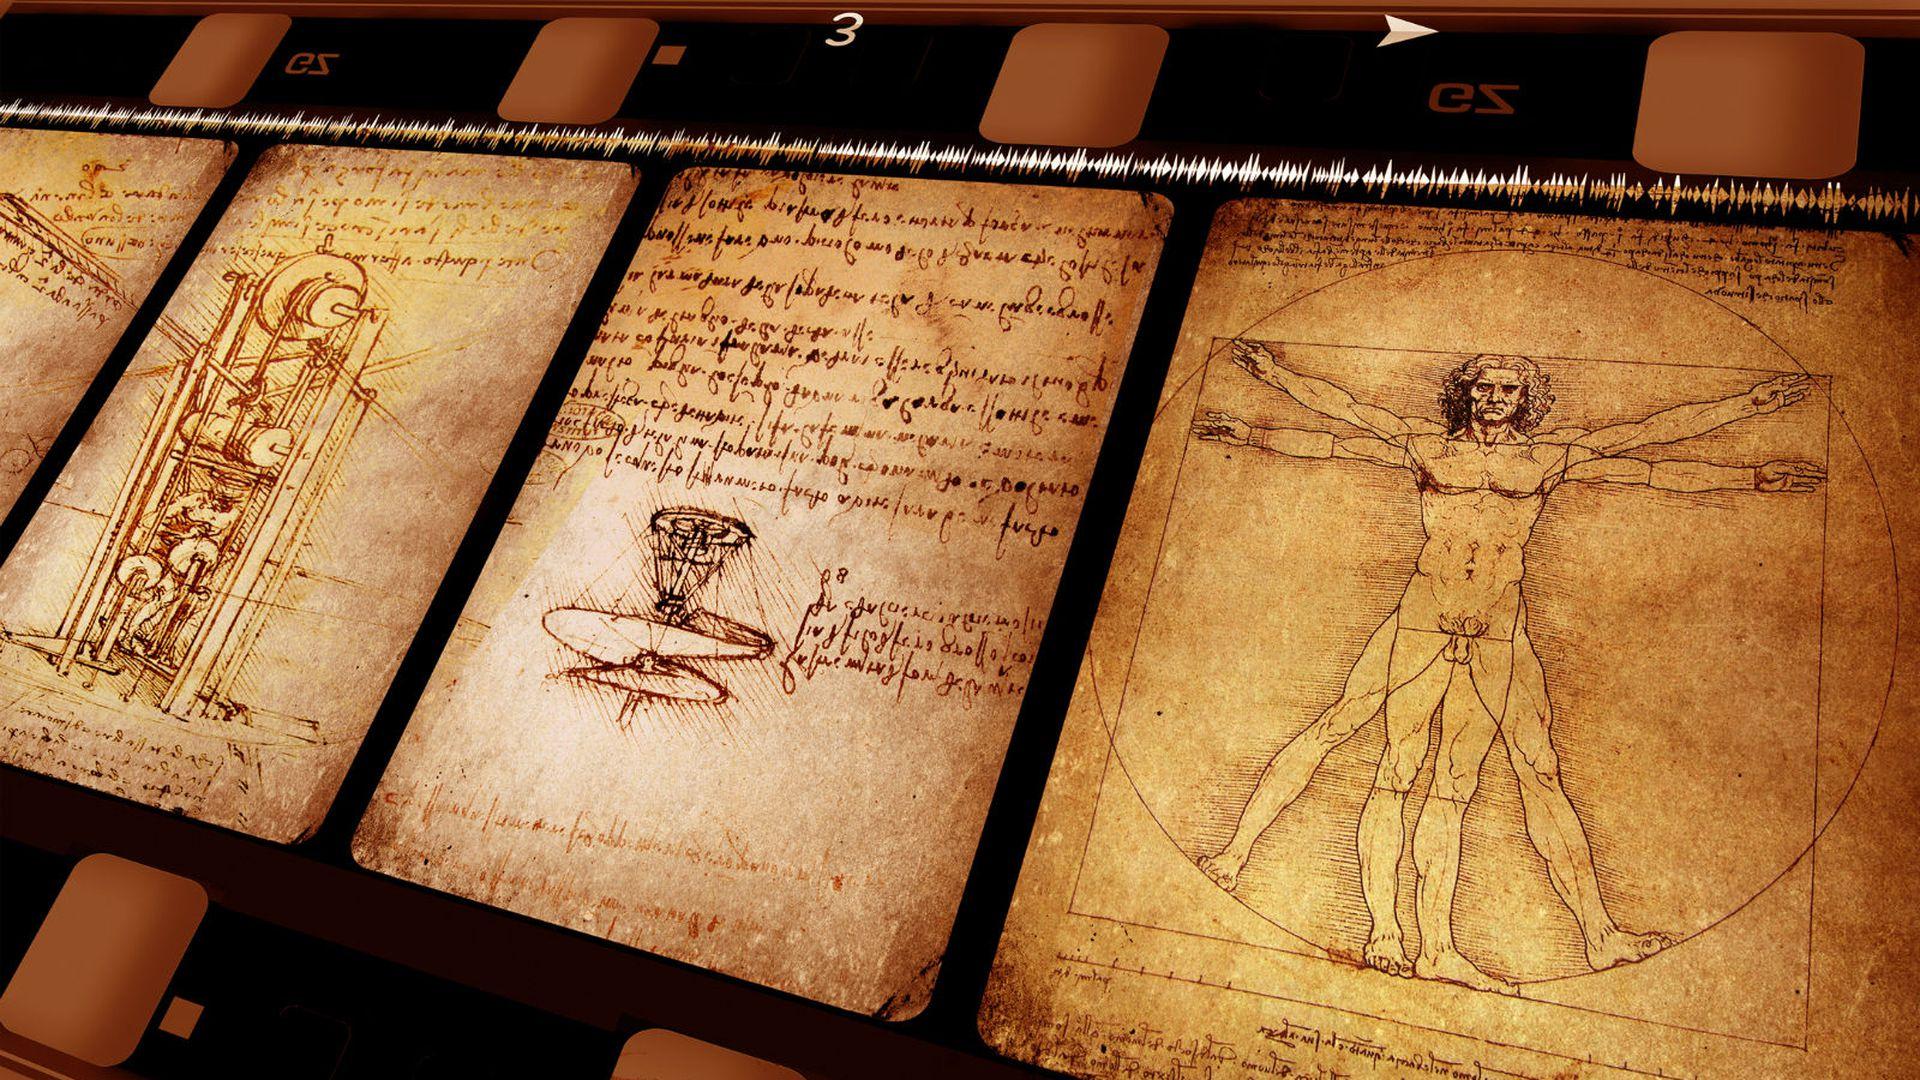 Korak do svetog grala Otkrijte tajne velike zavjere: Doživite Da Vincijev kod iz prve ruke